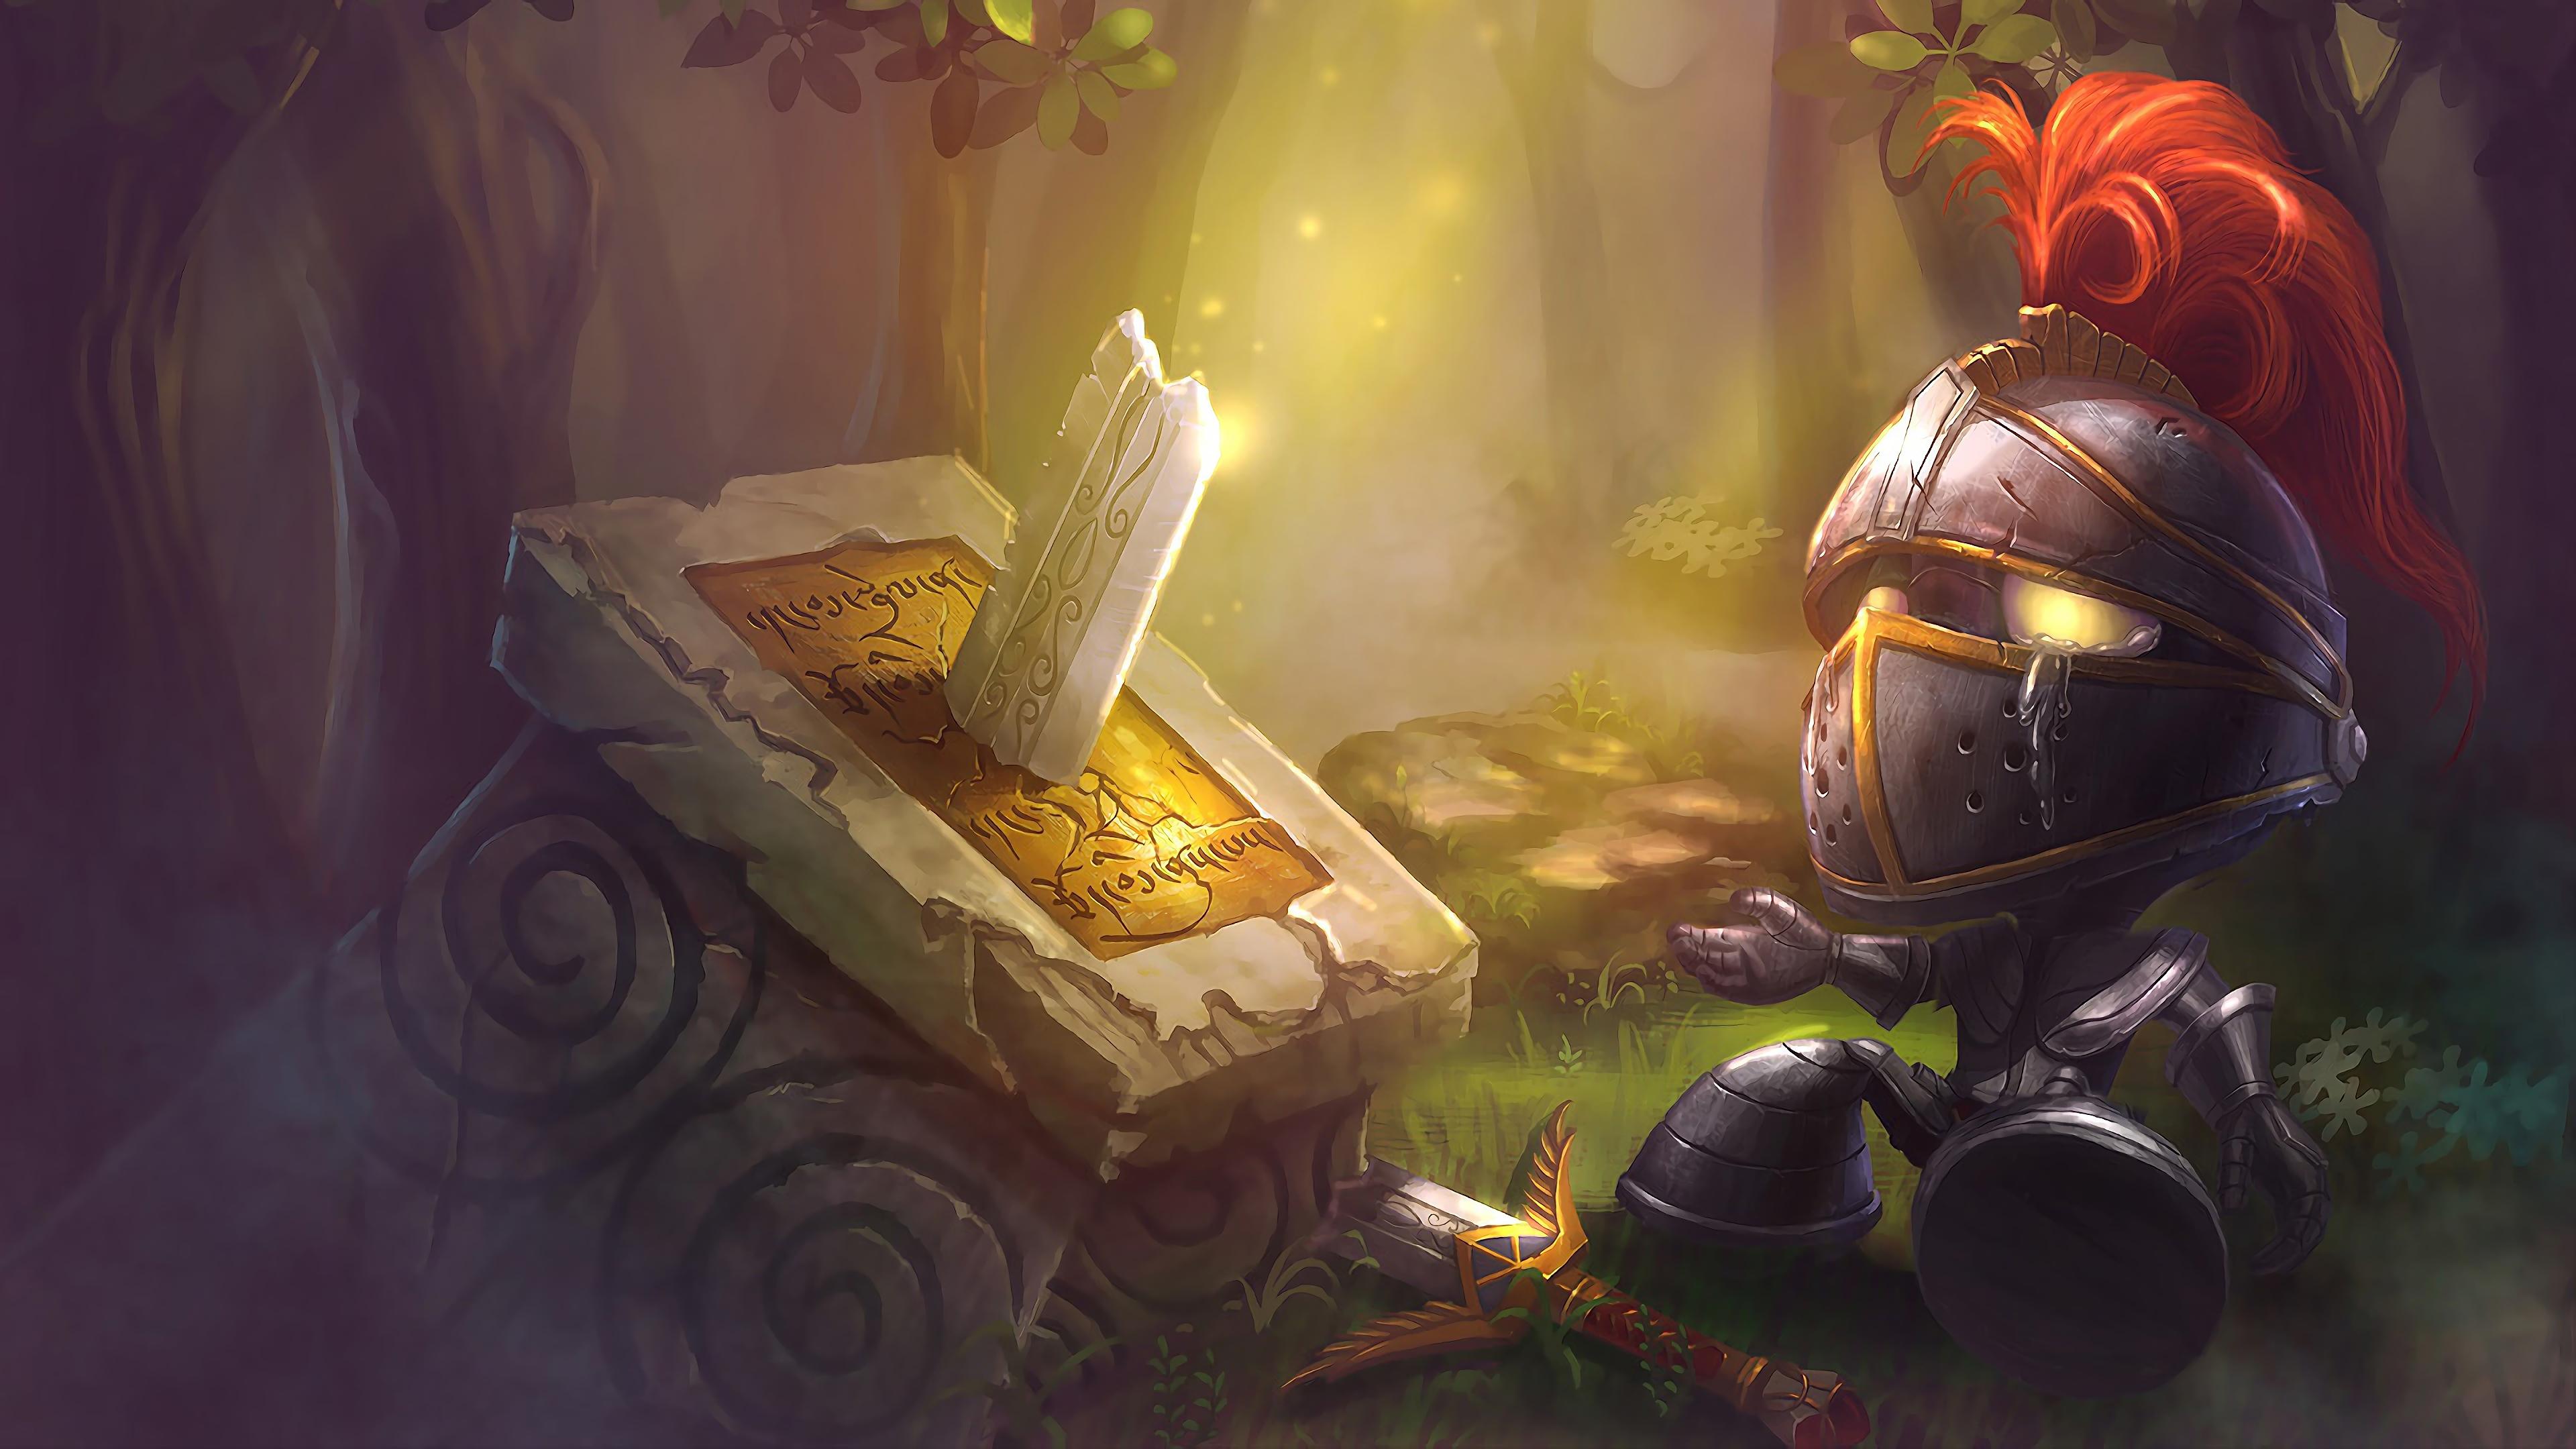 little knight amumu lol splash art league of legends 1574097826 - Little Knight Amumu LoL Splash Art League of Legends - league of legends, Amumu